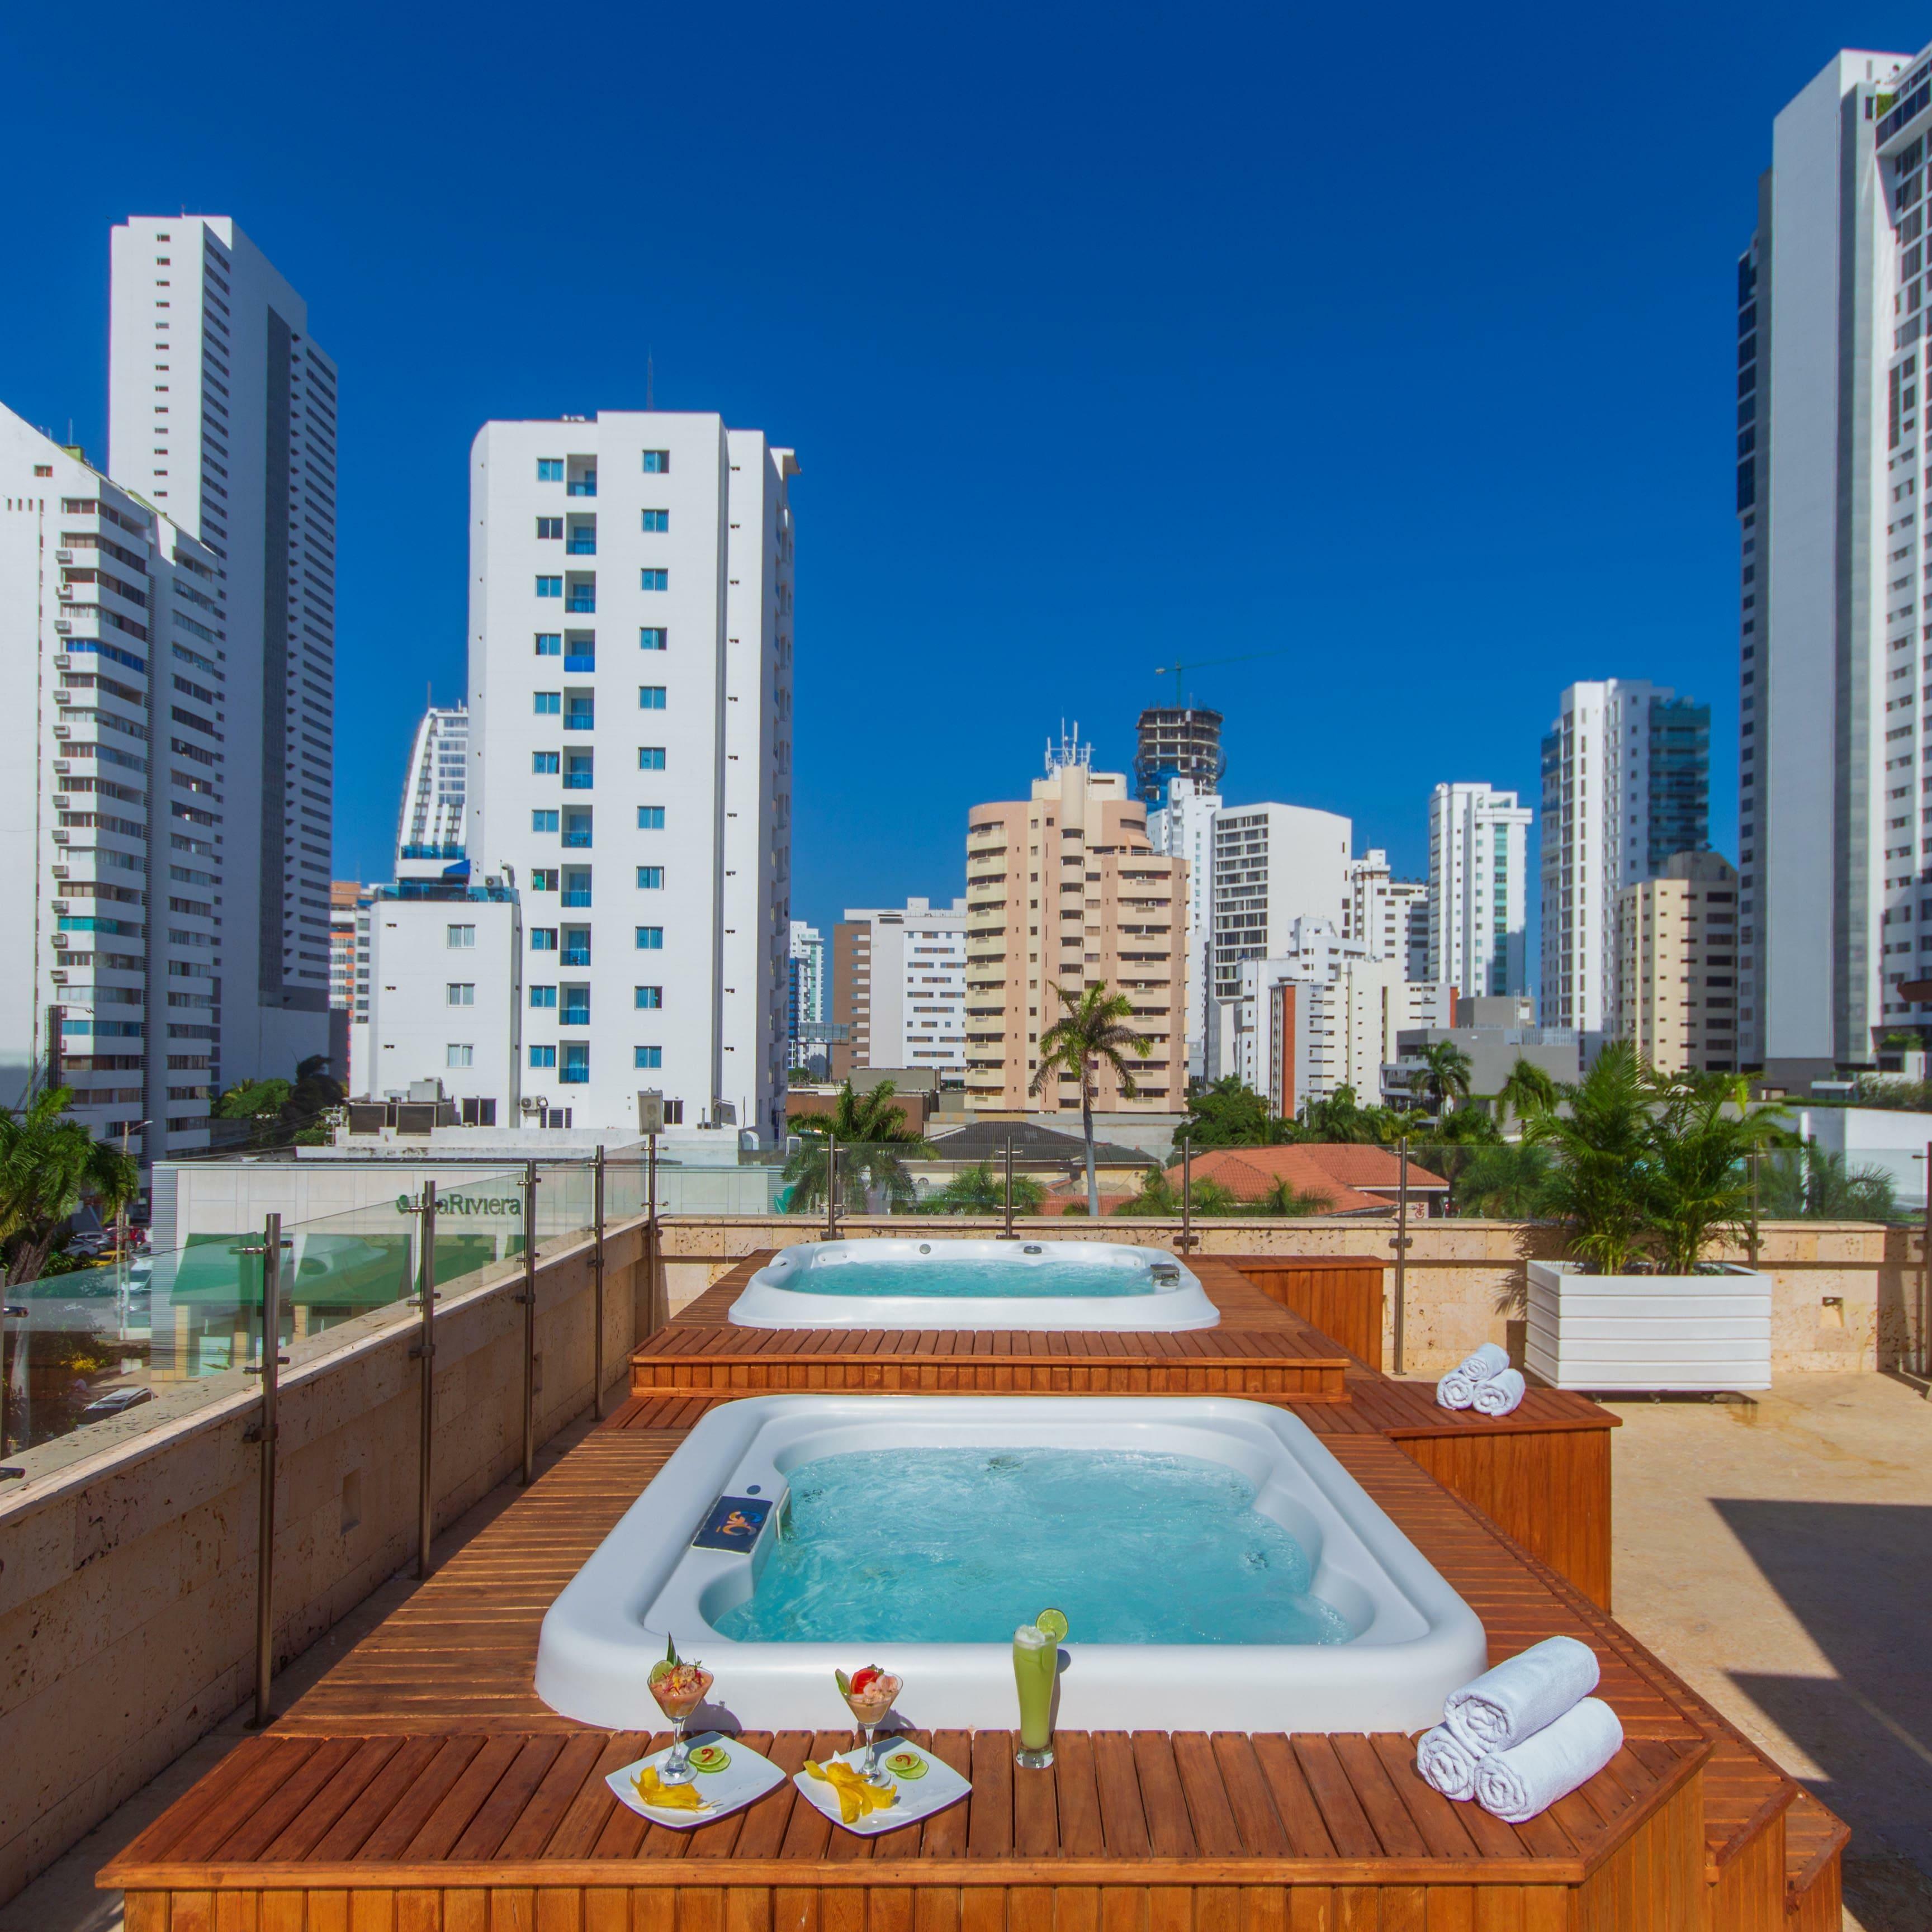 Hotel GIO Cartagena